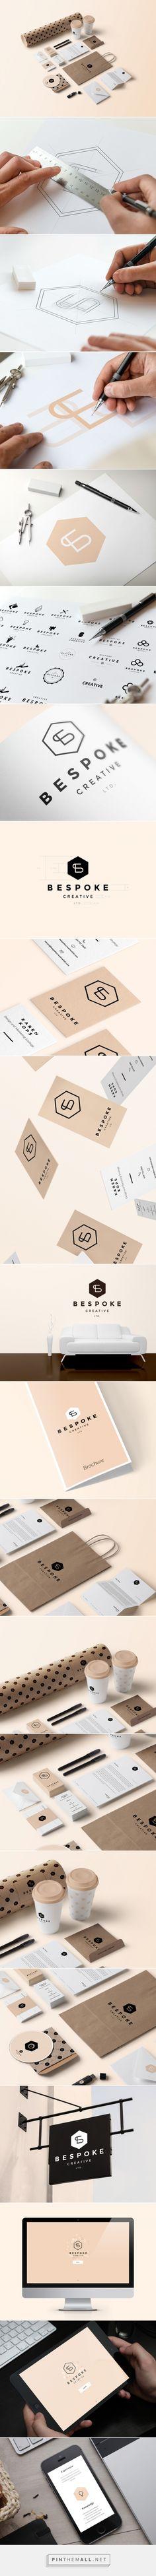 Graphic design corporative Branding and Website Design: Bespoke Creative by Tomasz Mazurczak Logo Design, Web Design, Brand Identity Design, Graphic Design Typography, Corporate Design, Business Design, Logo Inspiration, Editorial Design, Vector Logos